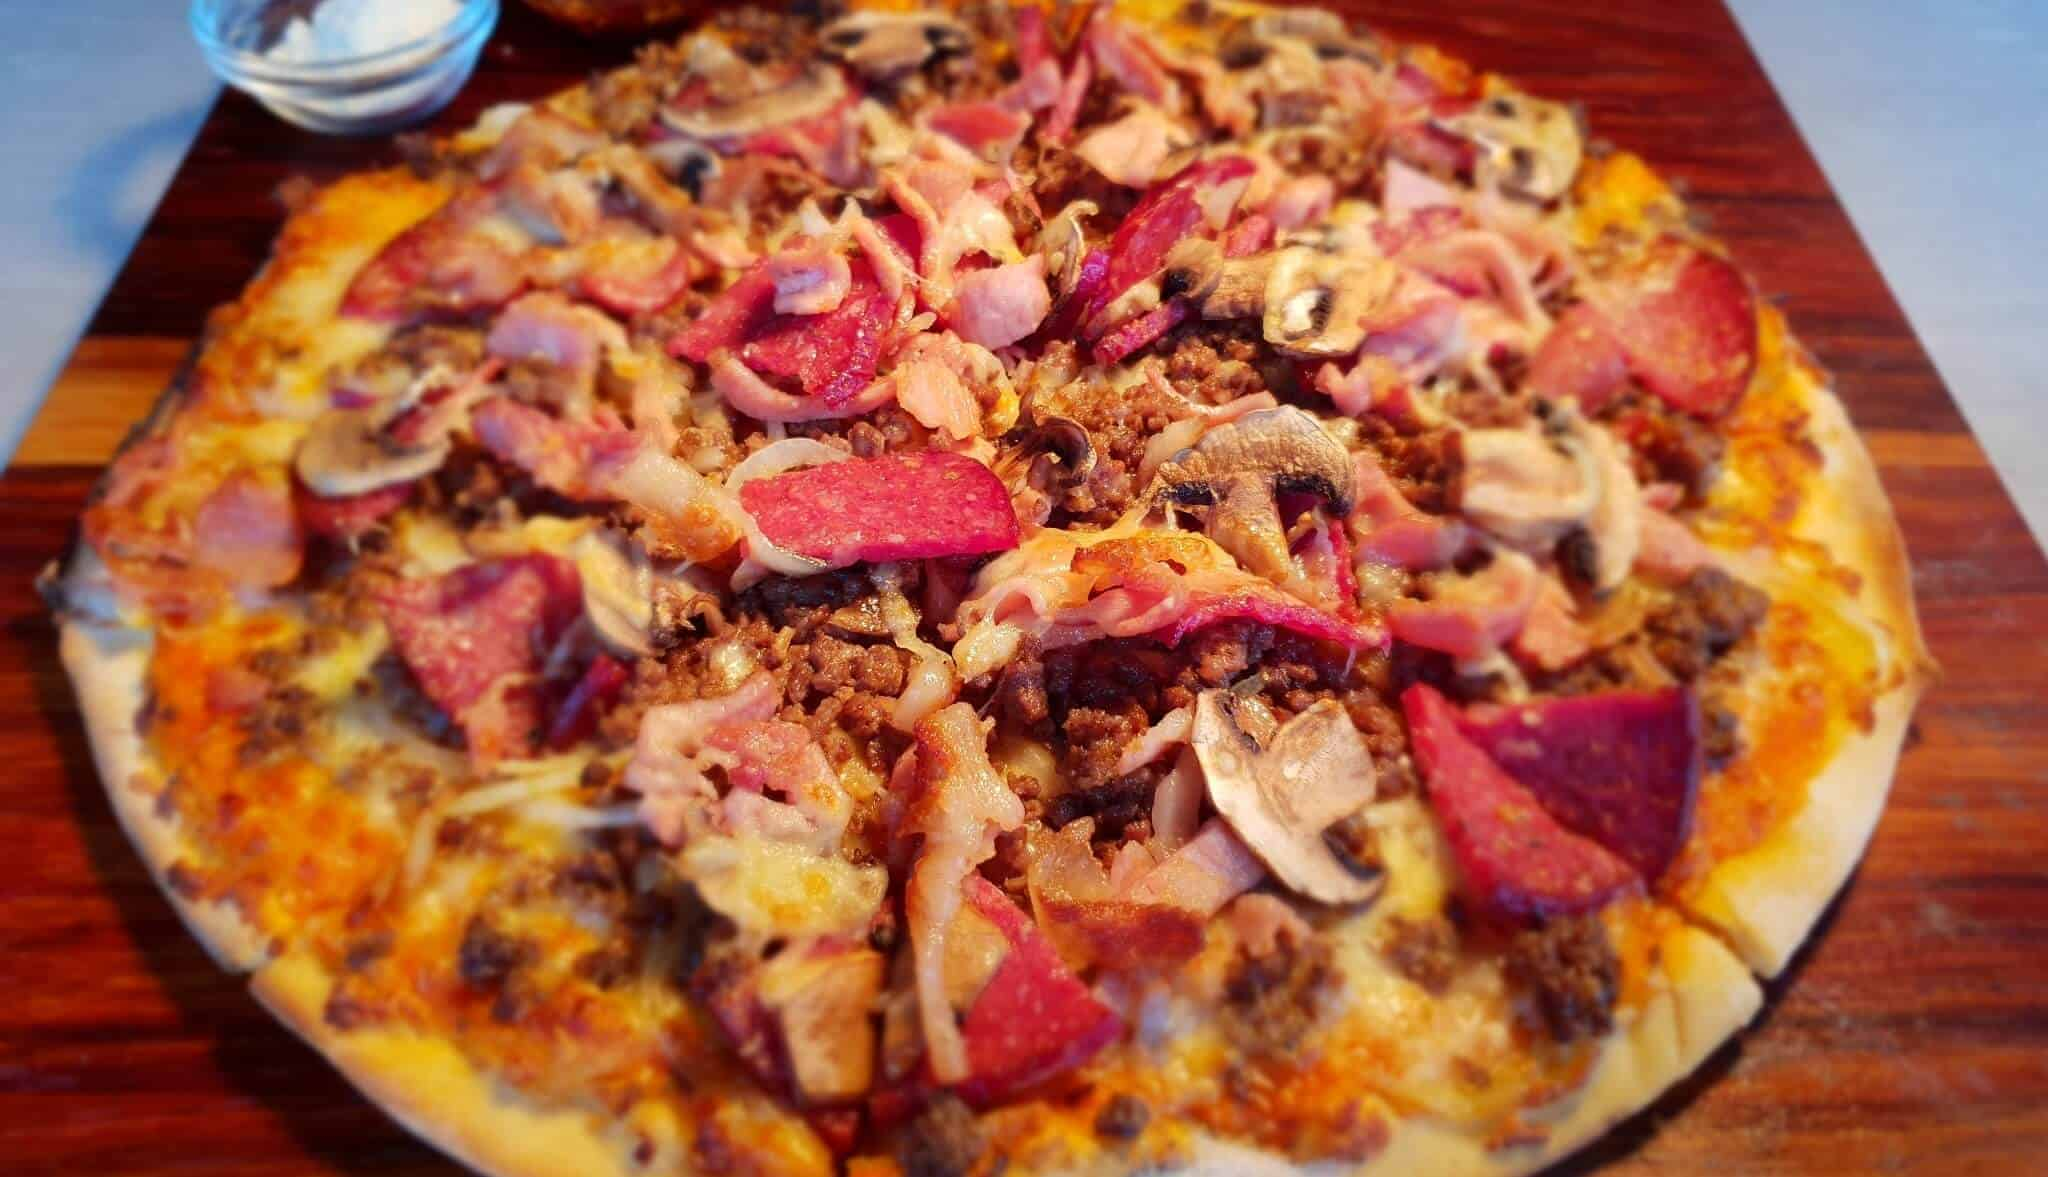 Arebbusch Travel Lodge Pizzeria & Grill   Pizzeria & Grill in Windhoek, Namibia   Arebbusch Meaty Pizza